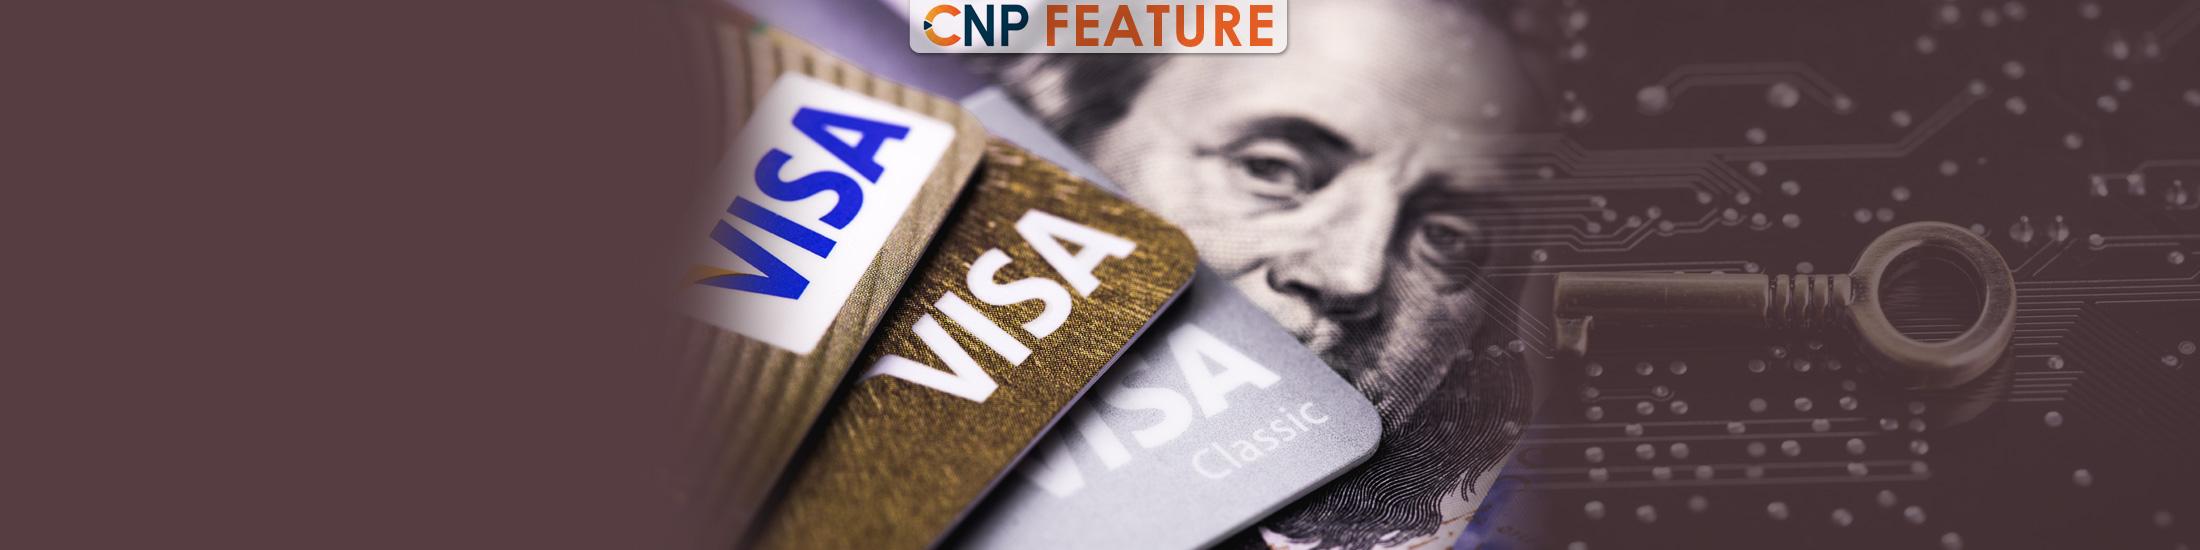 Decoding the 2021 Visa Chargeback Rule Updates